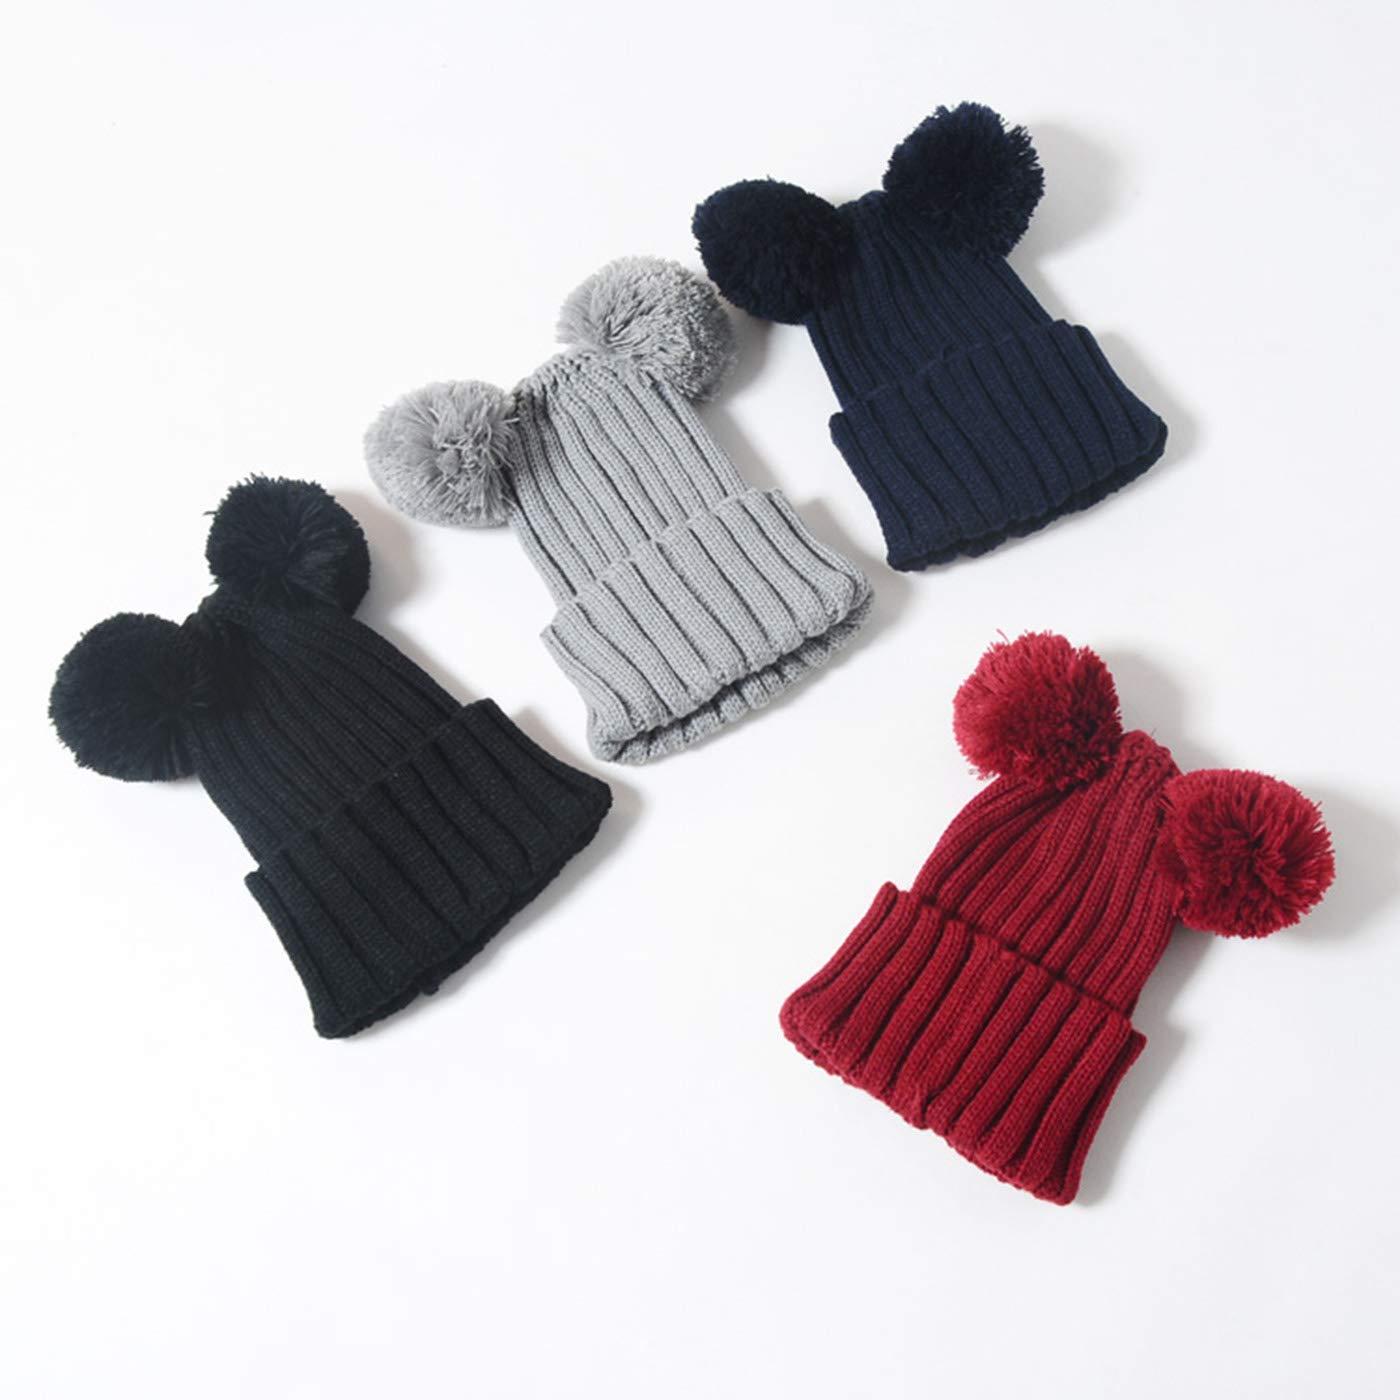 QOCAOFIG Baby Boys Girls Knitted Stretchy Pom Pom Beanie Hat,Winter Warm Knitting Handmade Beanie Caps